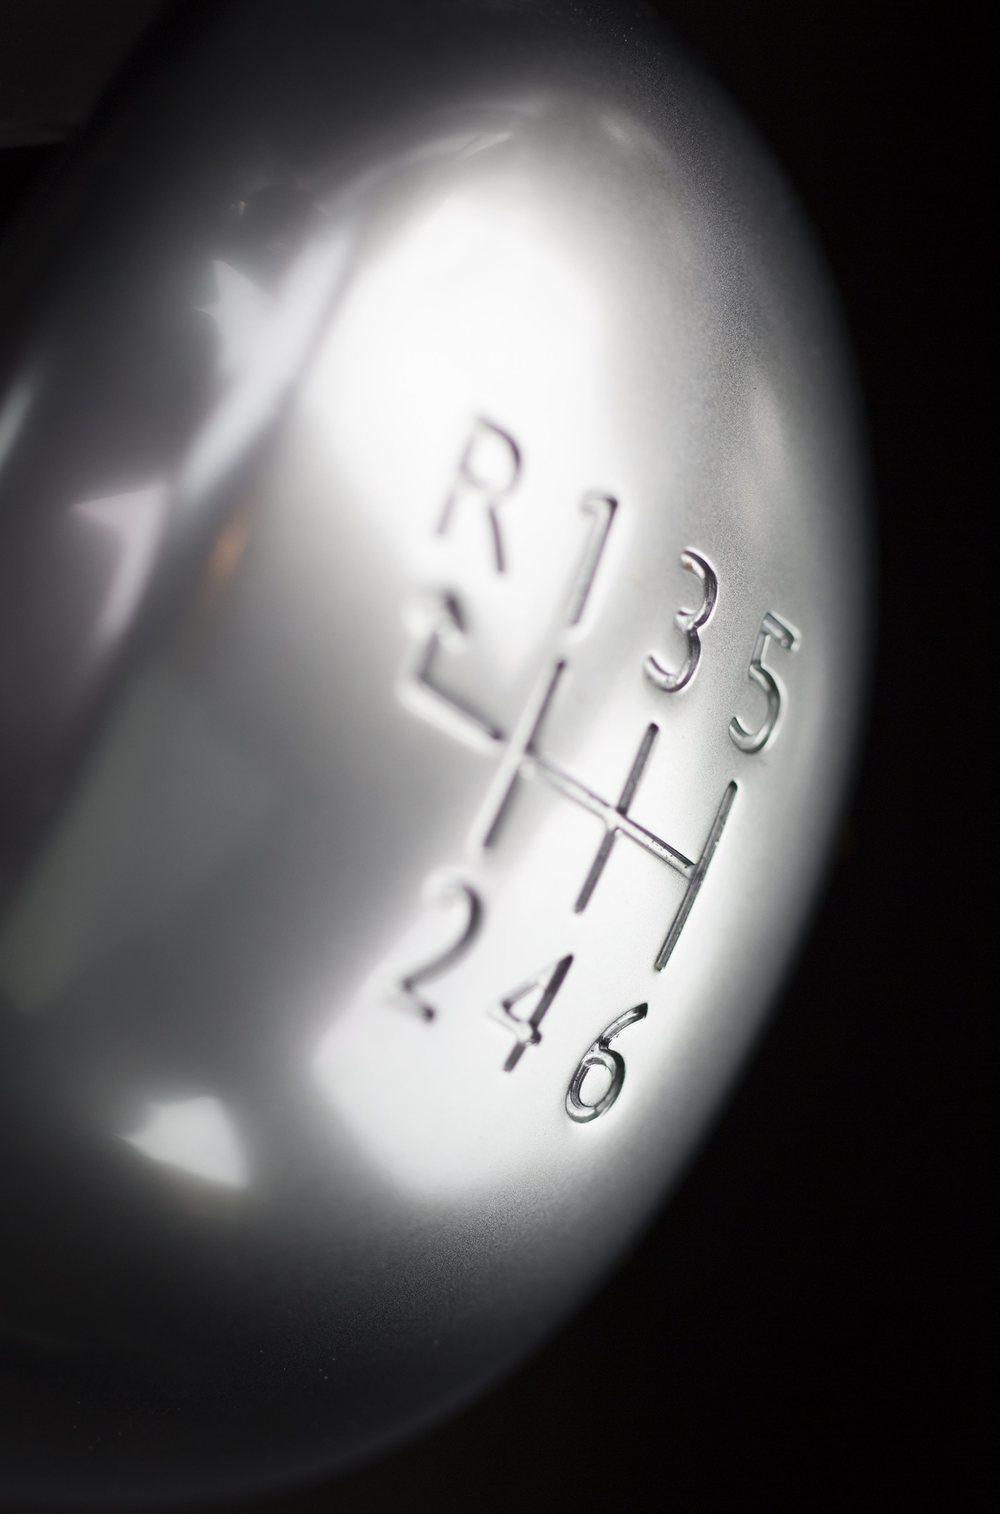 PEUGEOT+2008+DETALLE+PALANCA+CAMBIO+%28Copiar%29